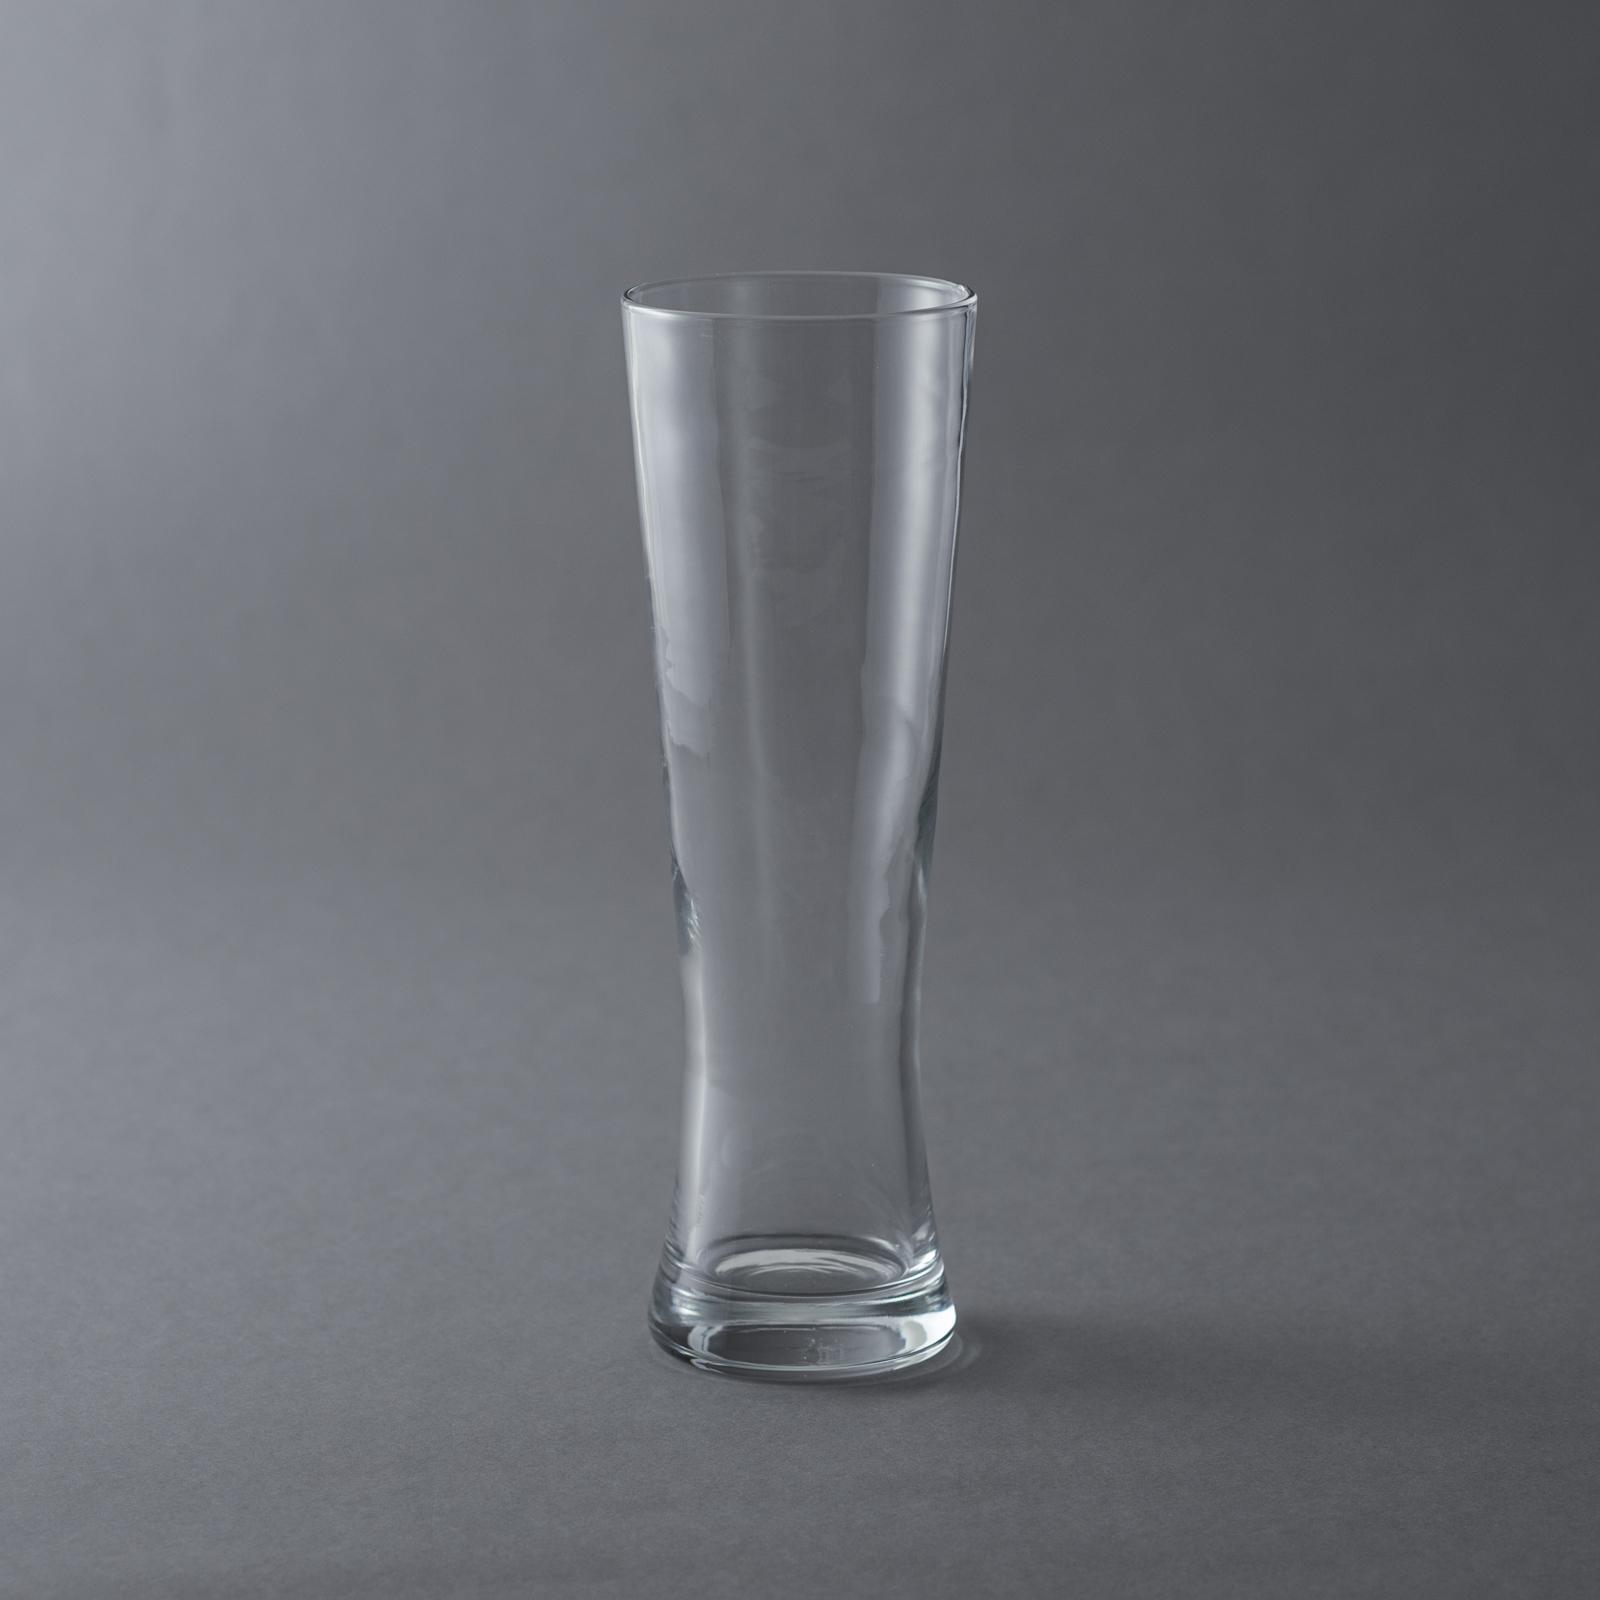 BOHEMIA Cristal _ ビールグラス 600ml